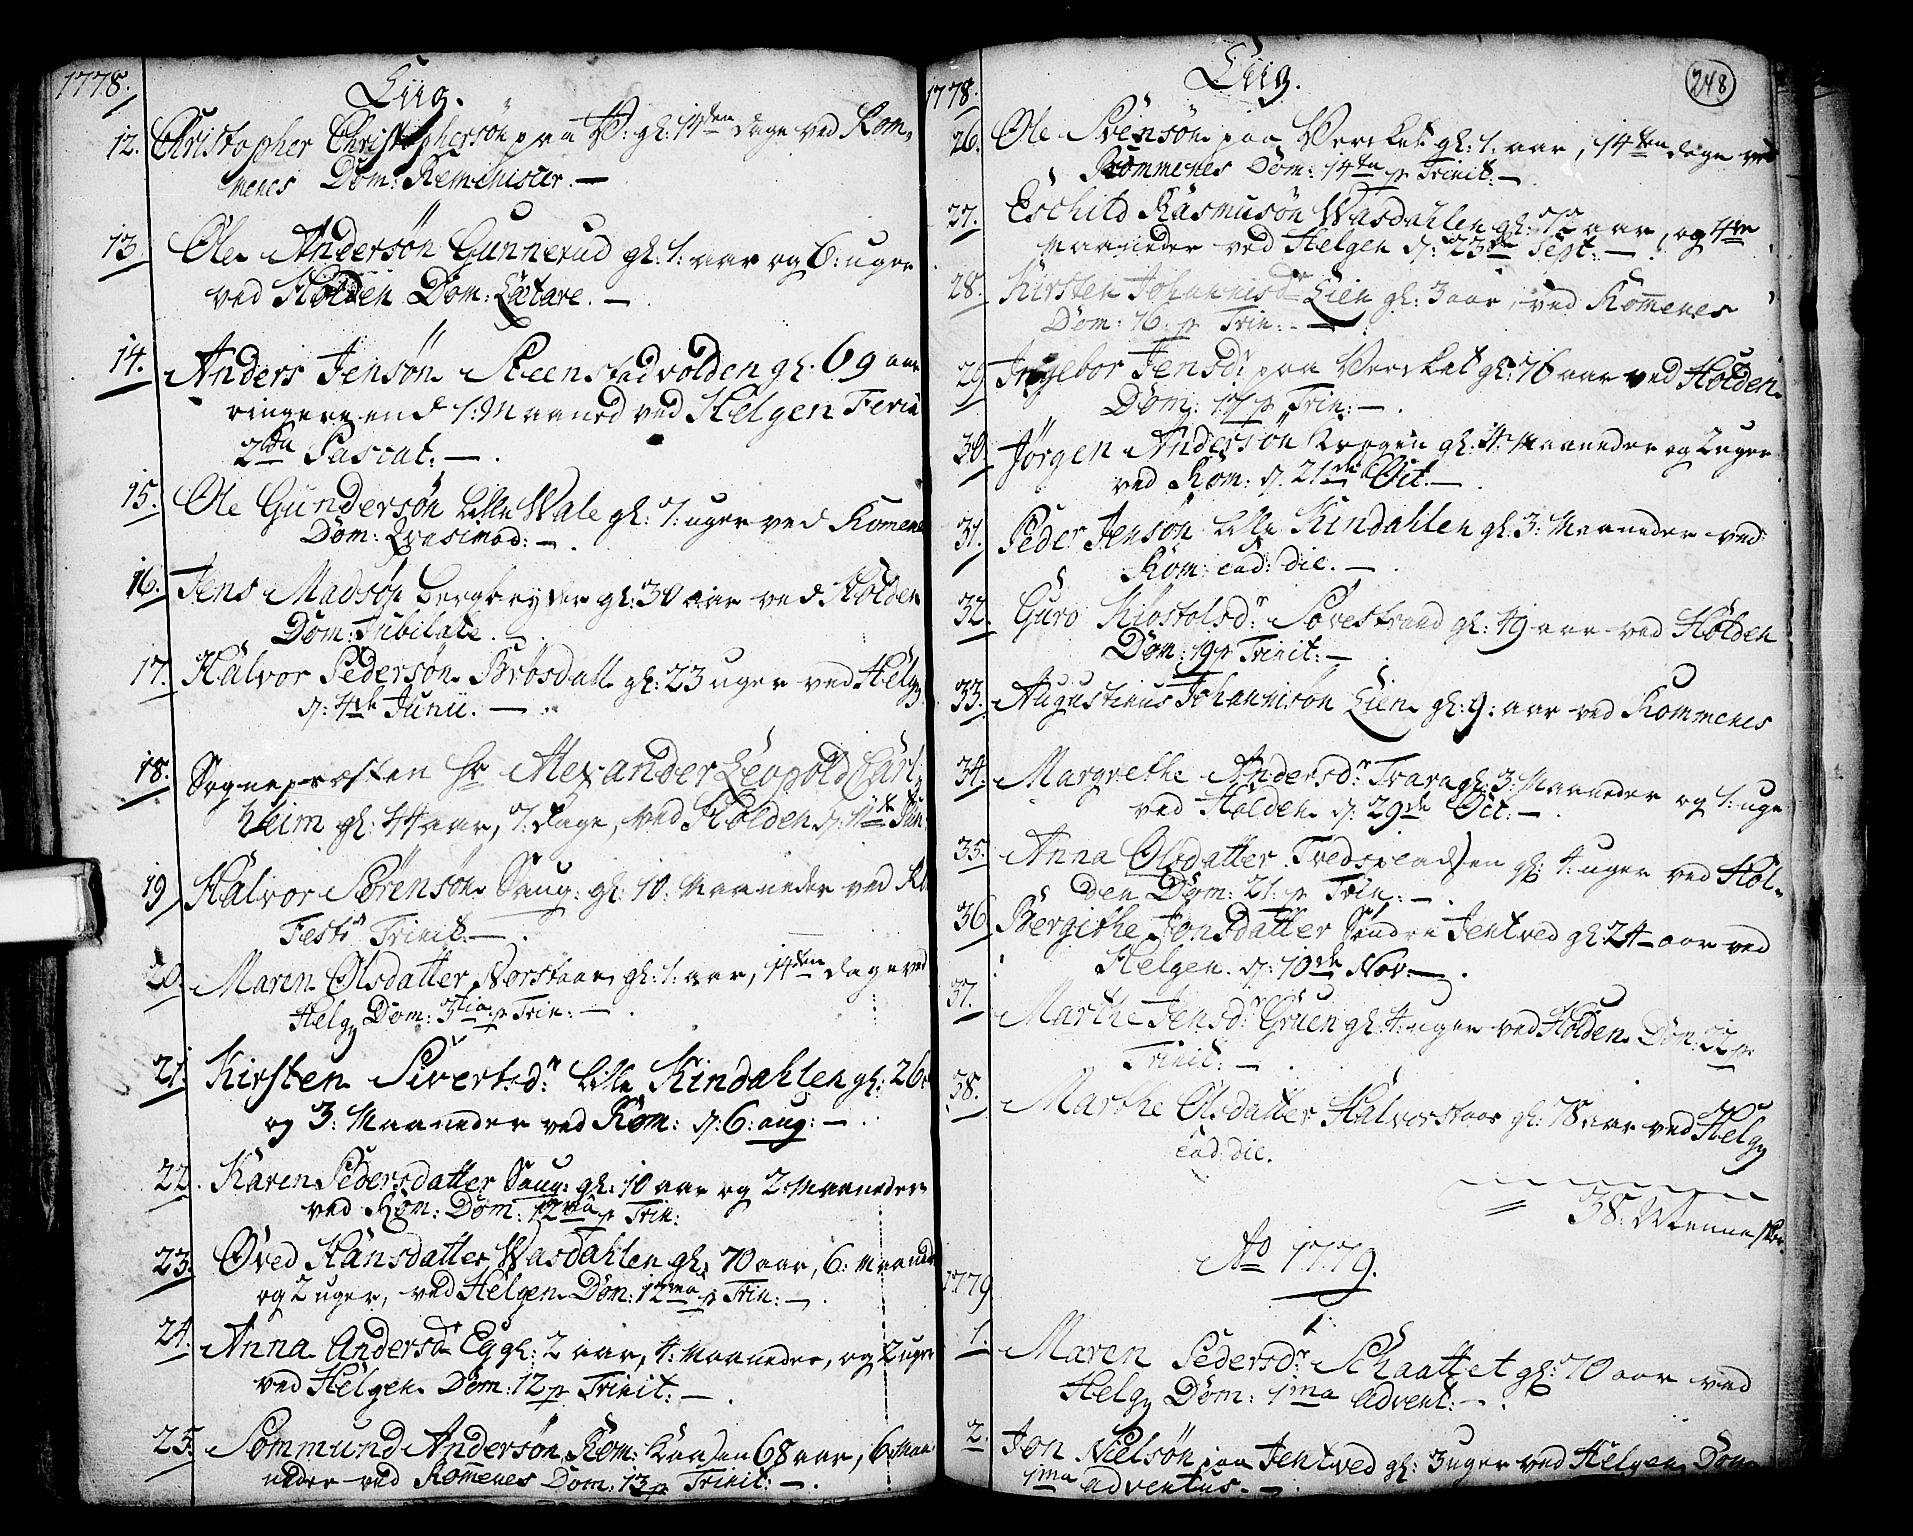 SAKO, Holla kirkebøker, F/Fa/L0001: Ministerialbok nr. 1, 1717-1779, s. 248